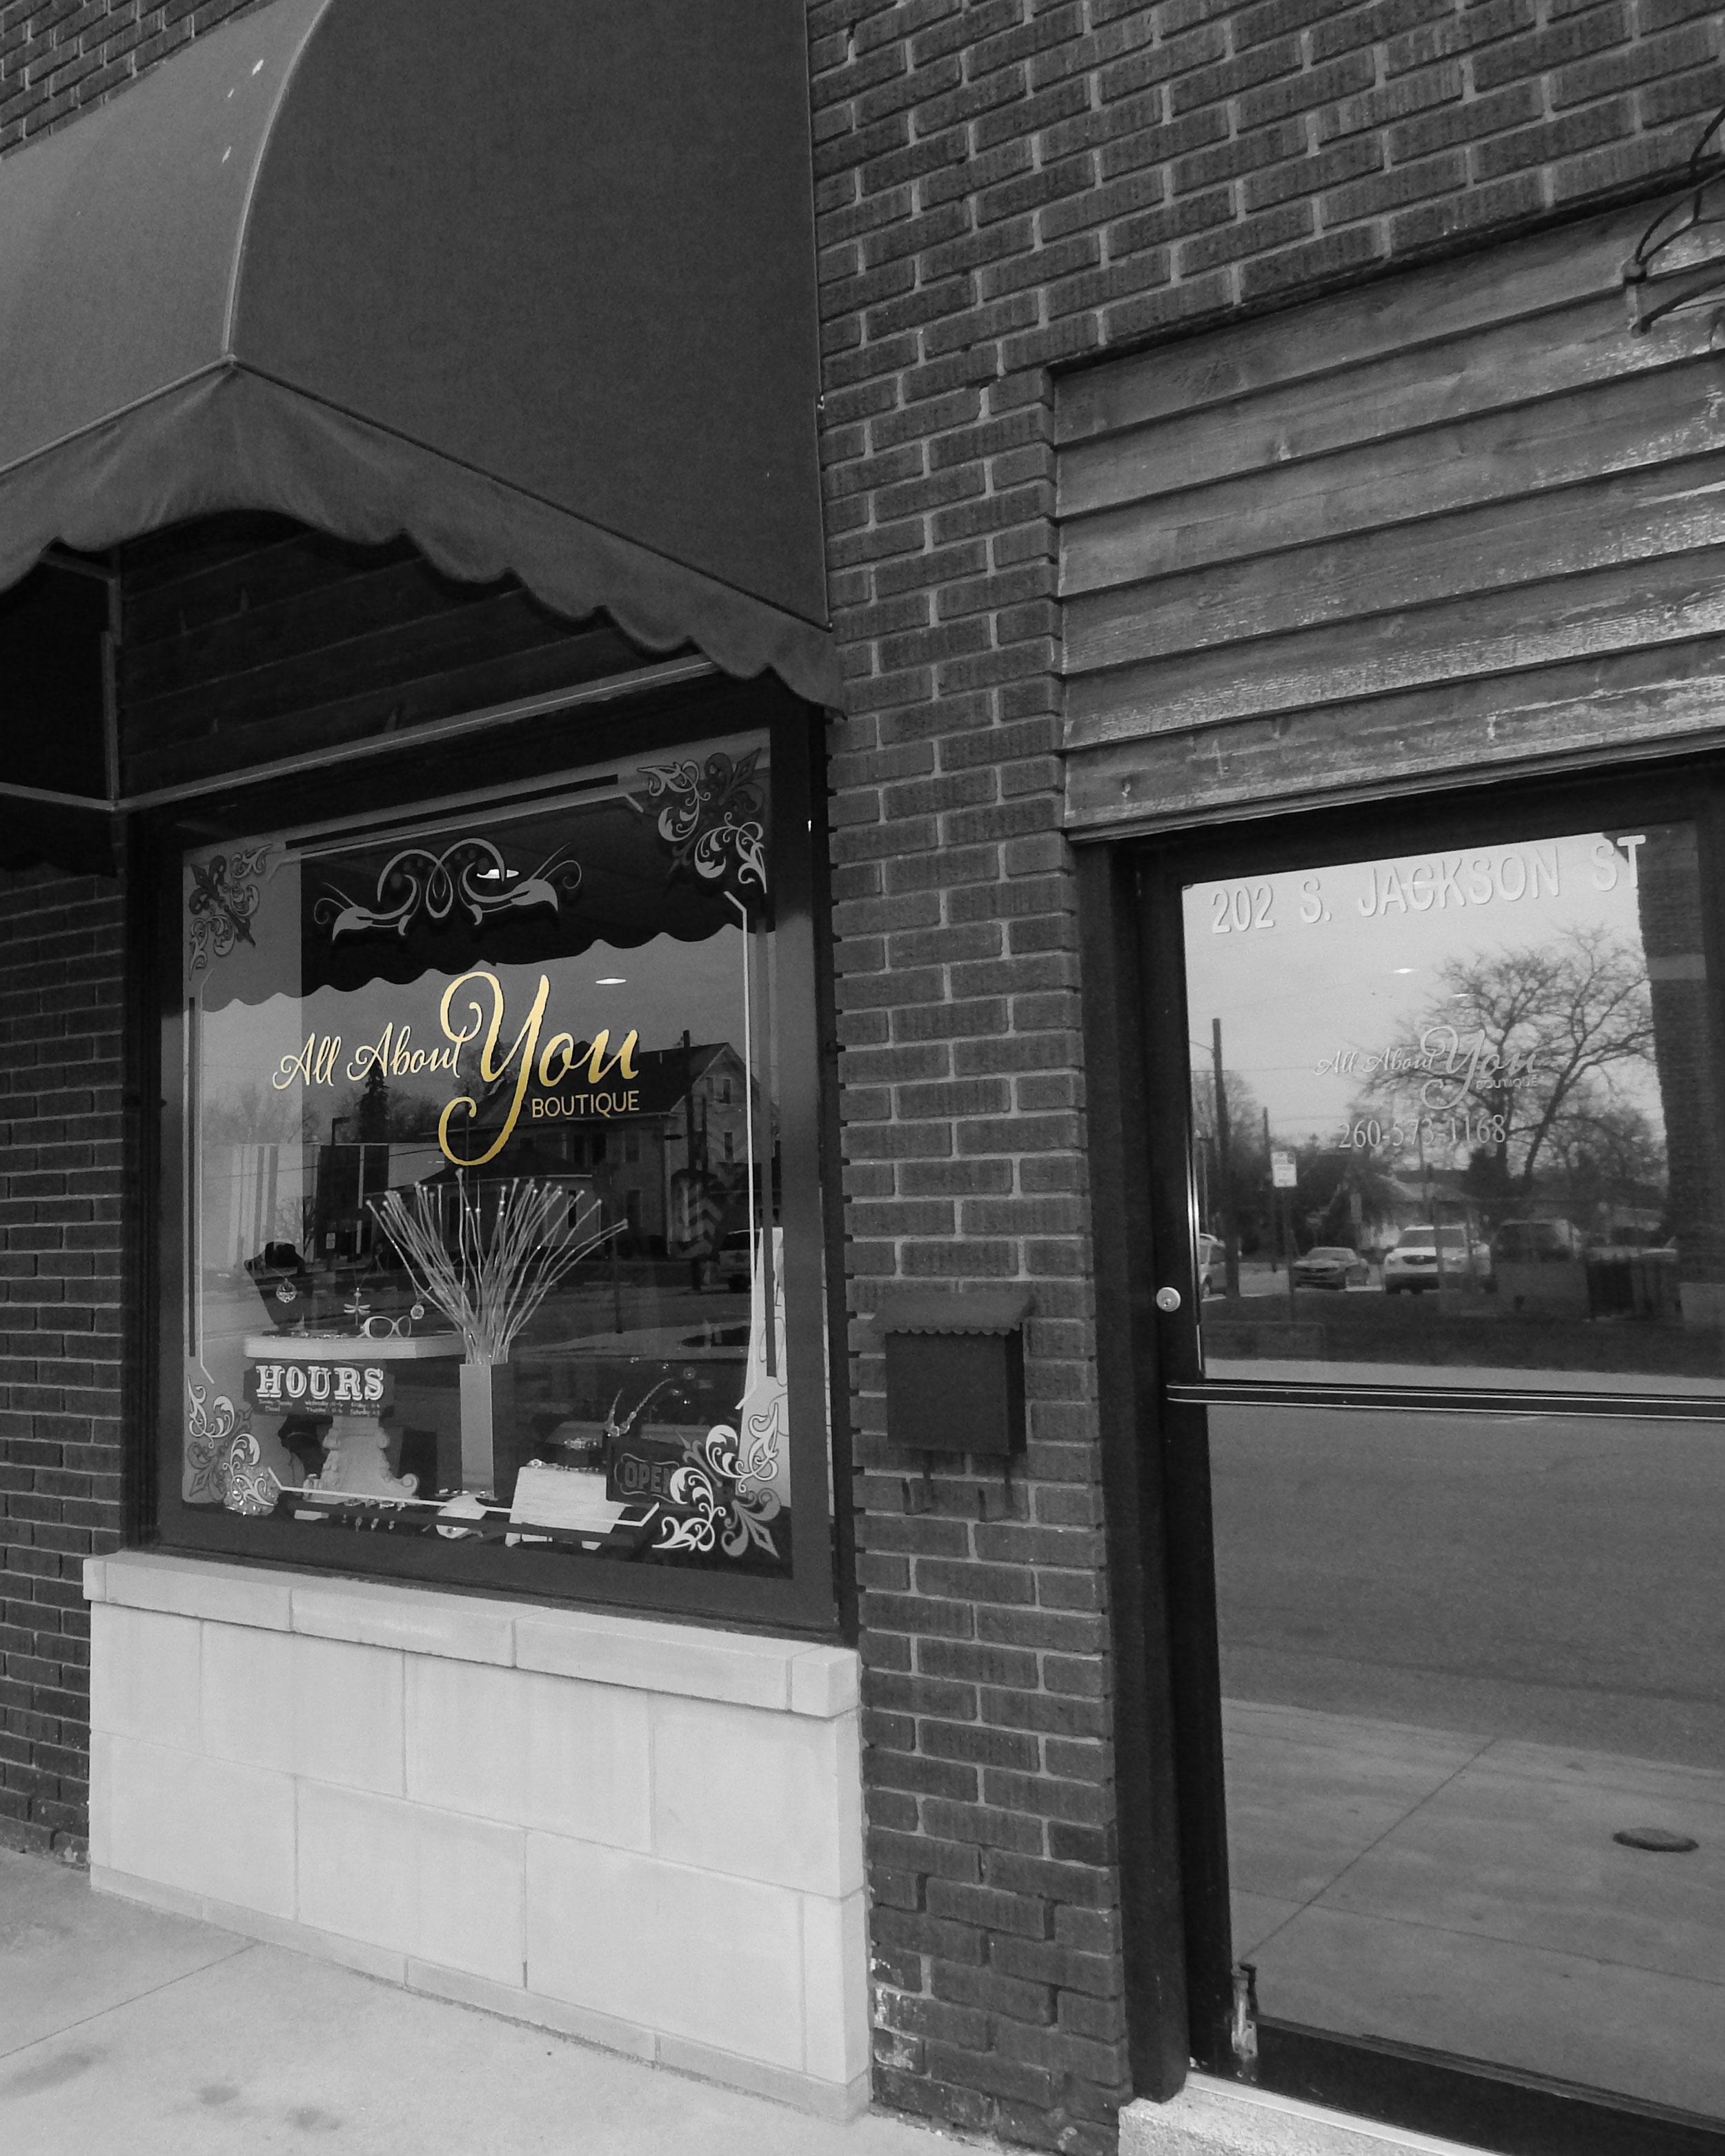 Located at 202 S. Jackson Street, Auburn, IN 46706